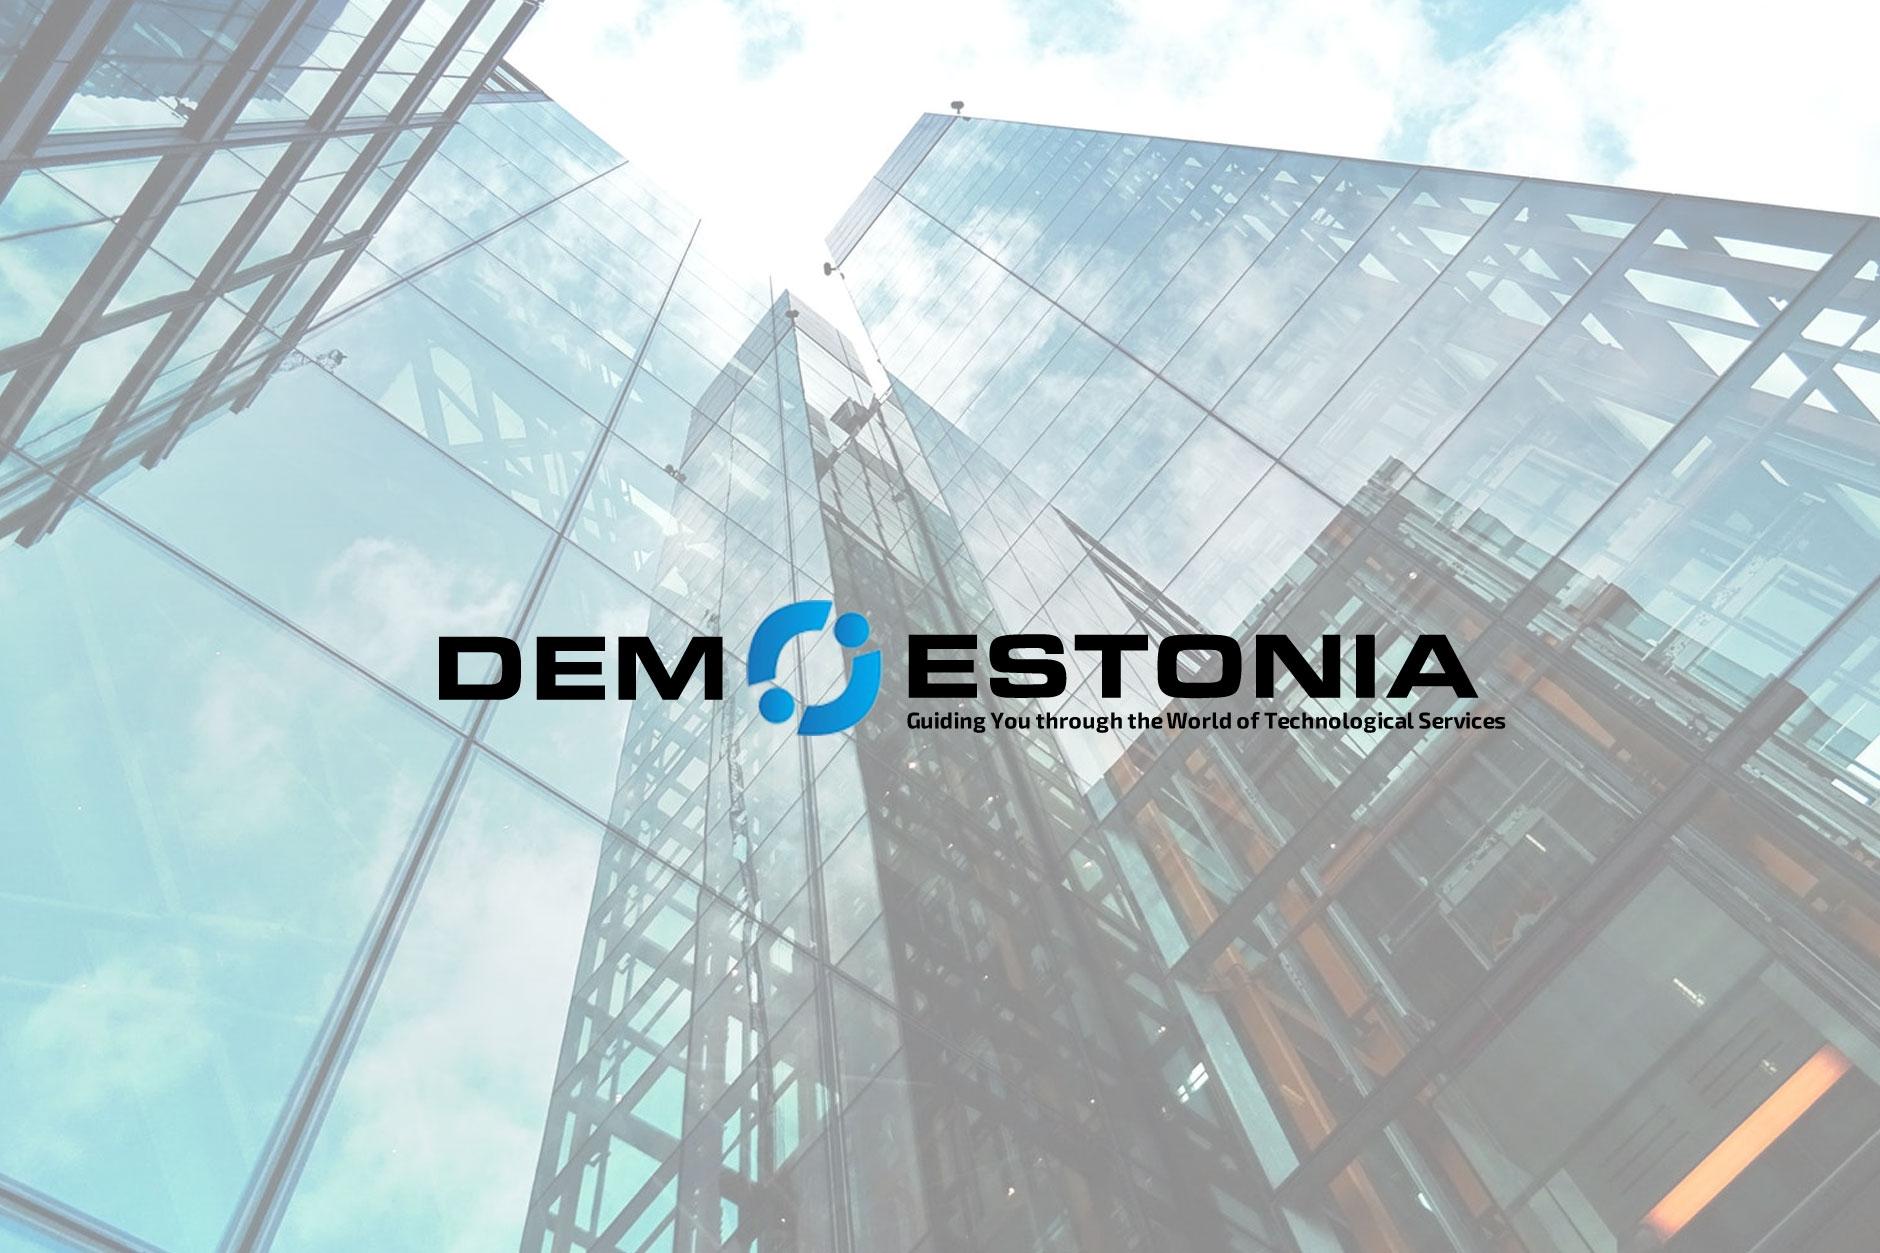 demoestonia (@demoestonia) Cover Image